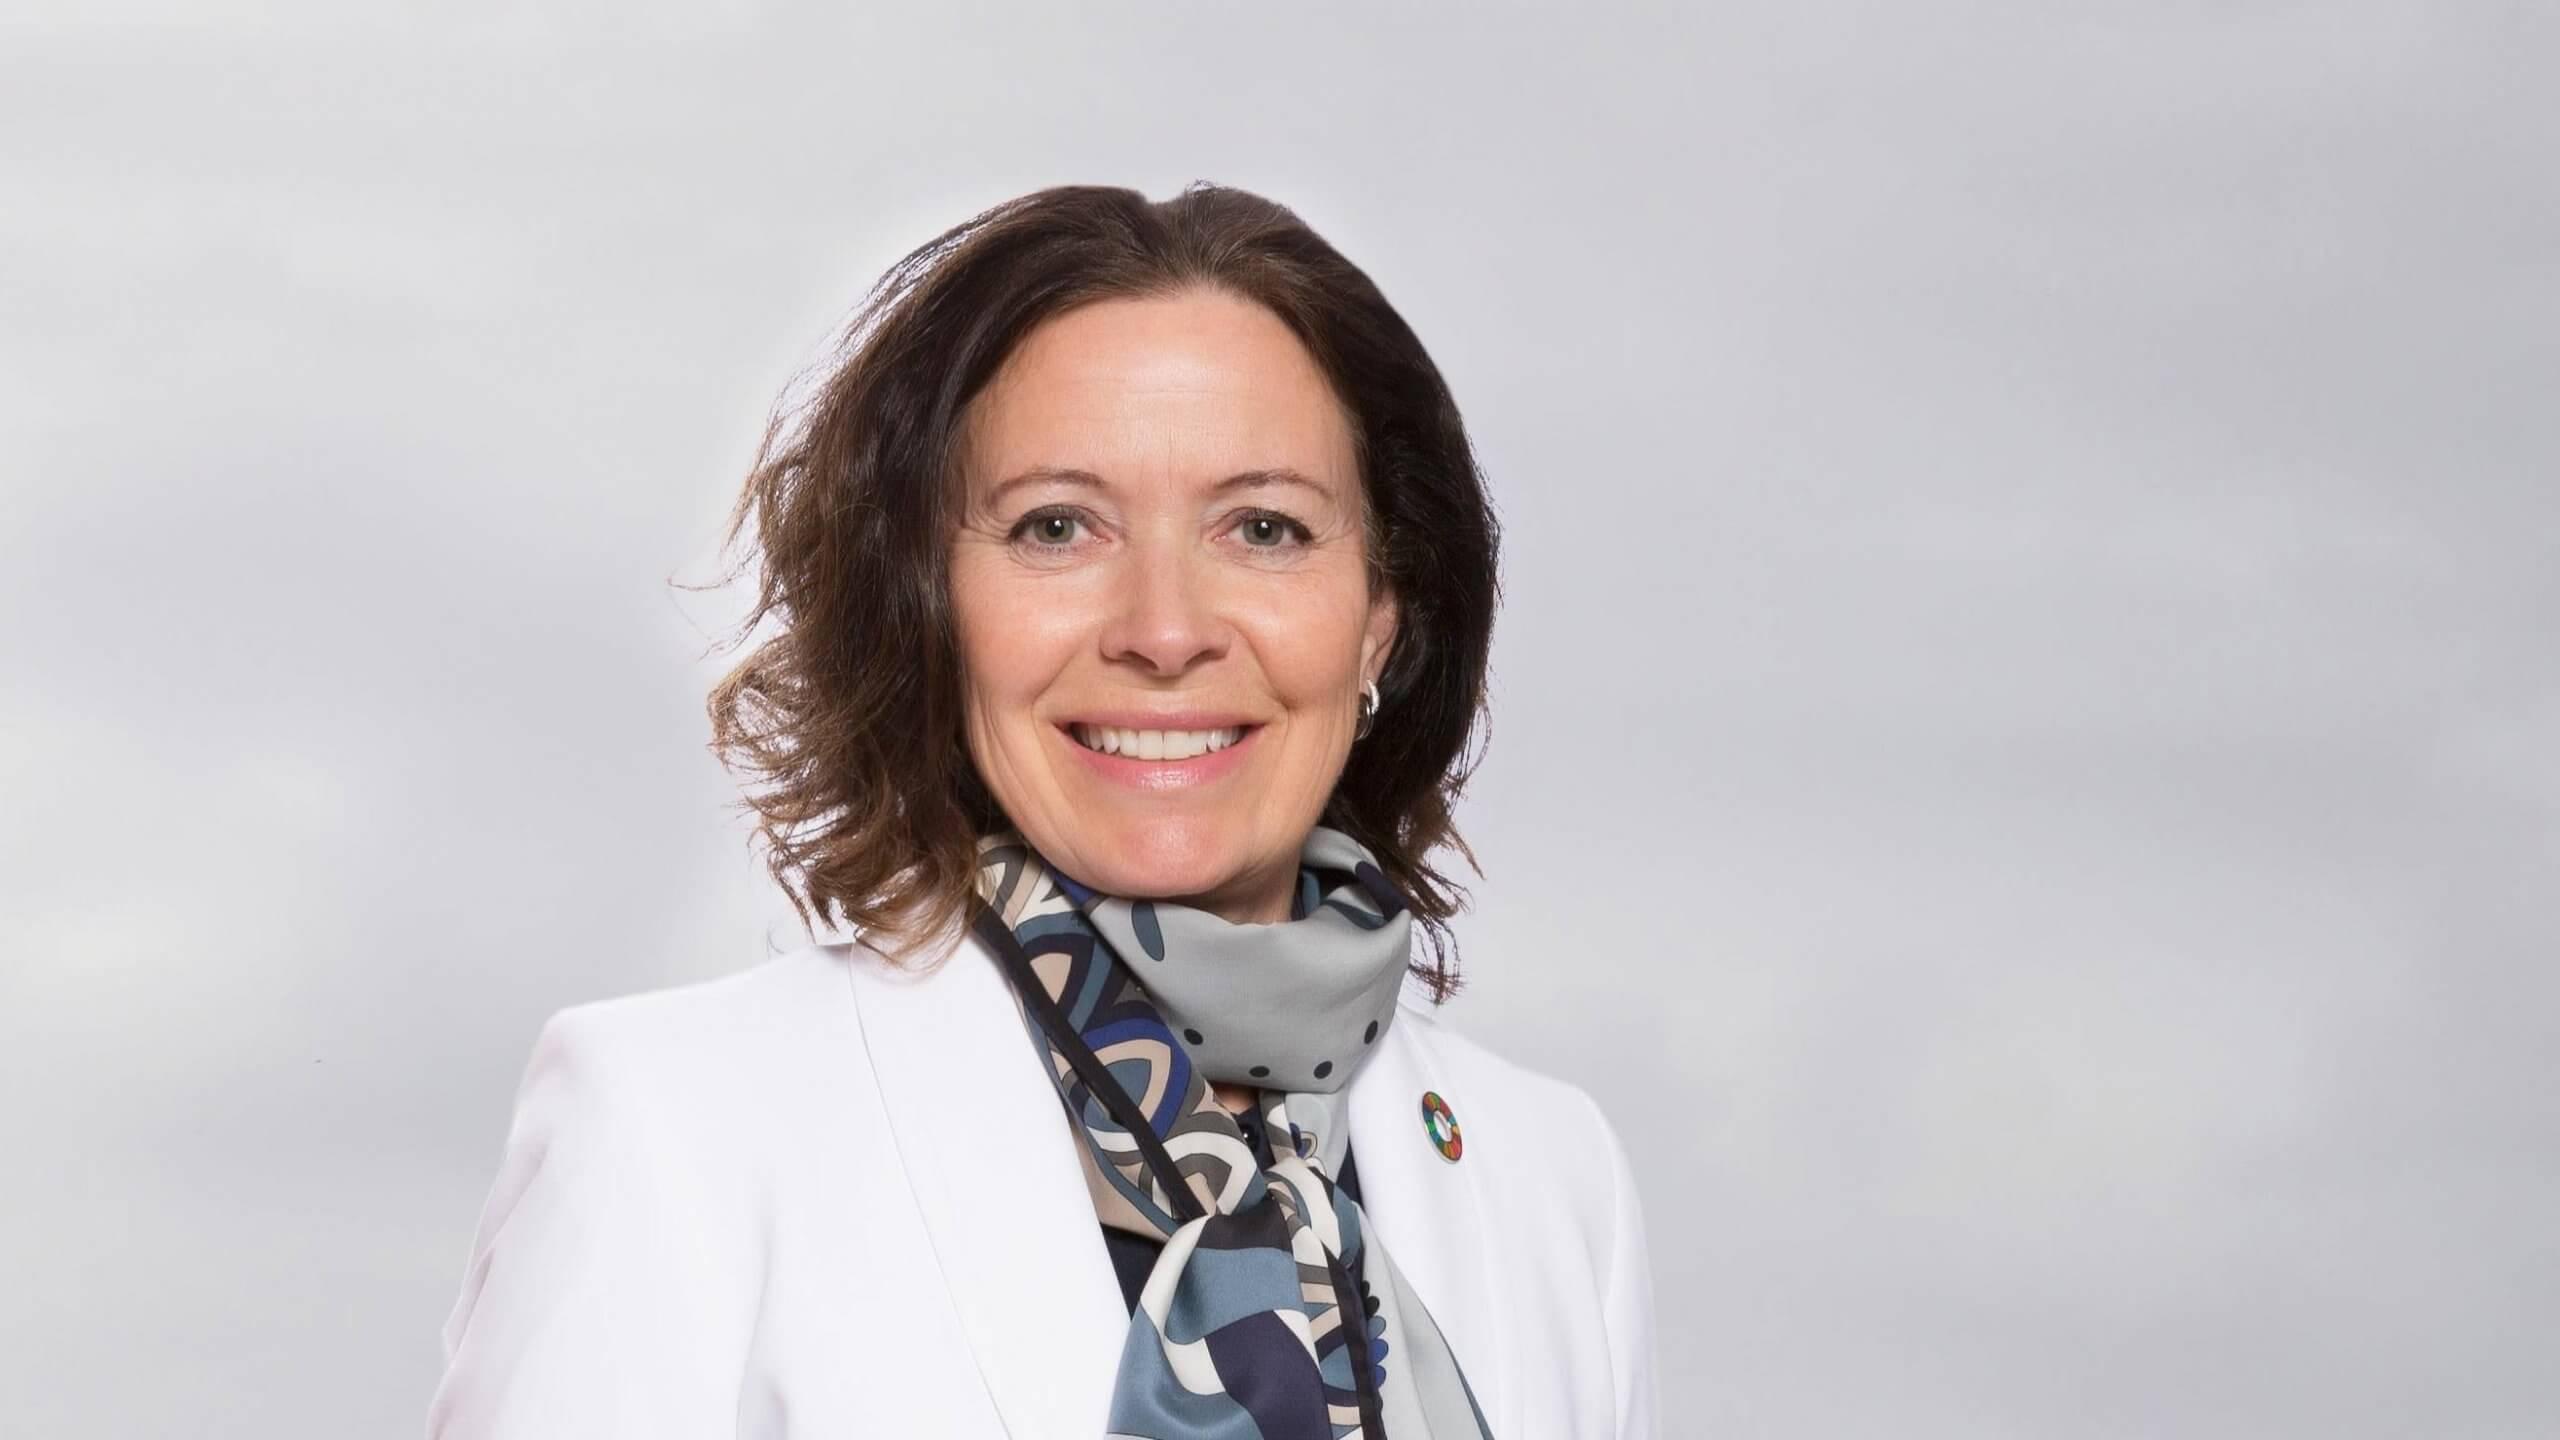 Kari Sofie Bjørnsen : Board Member